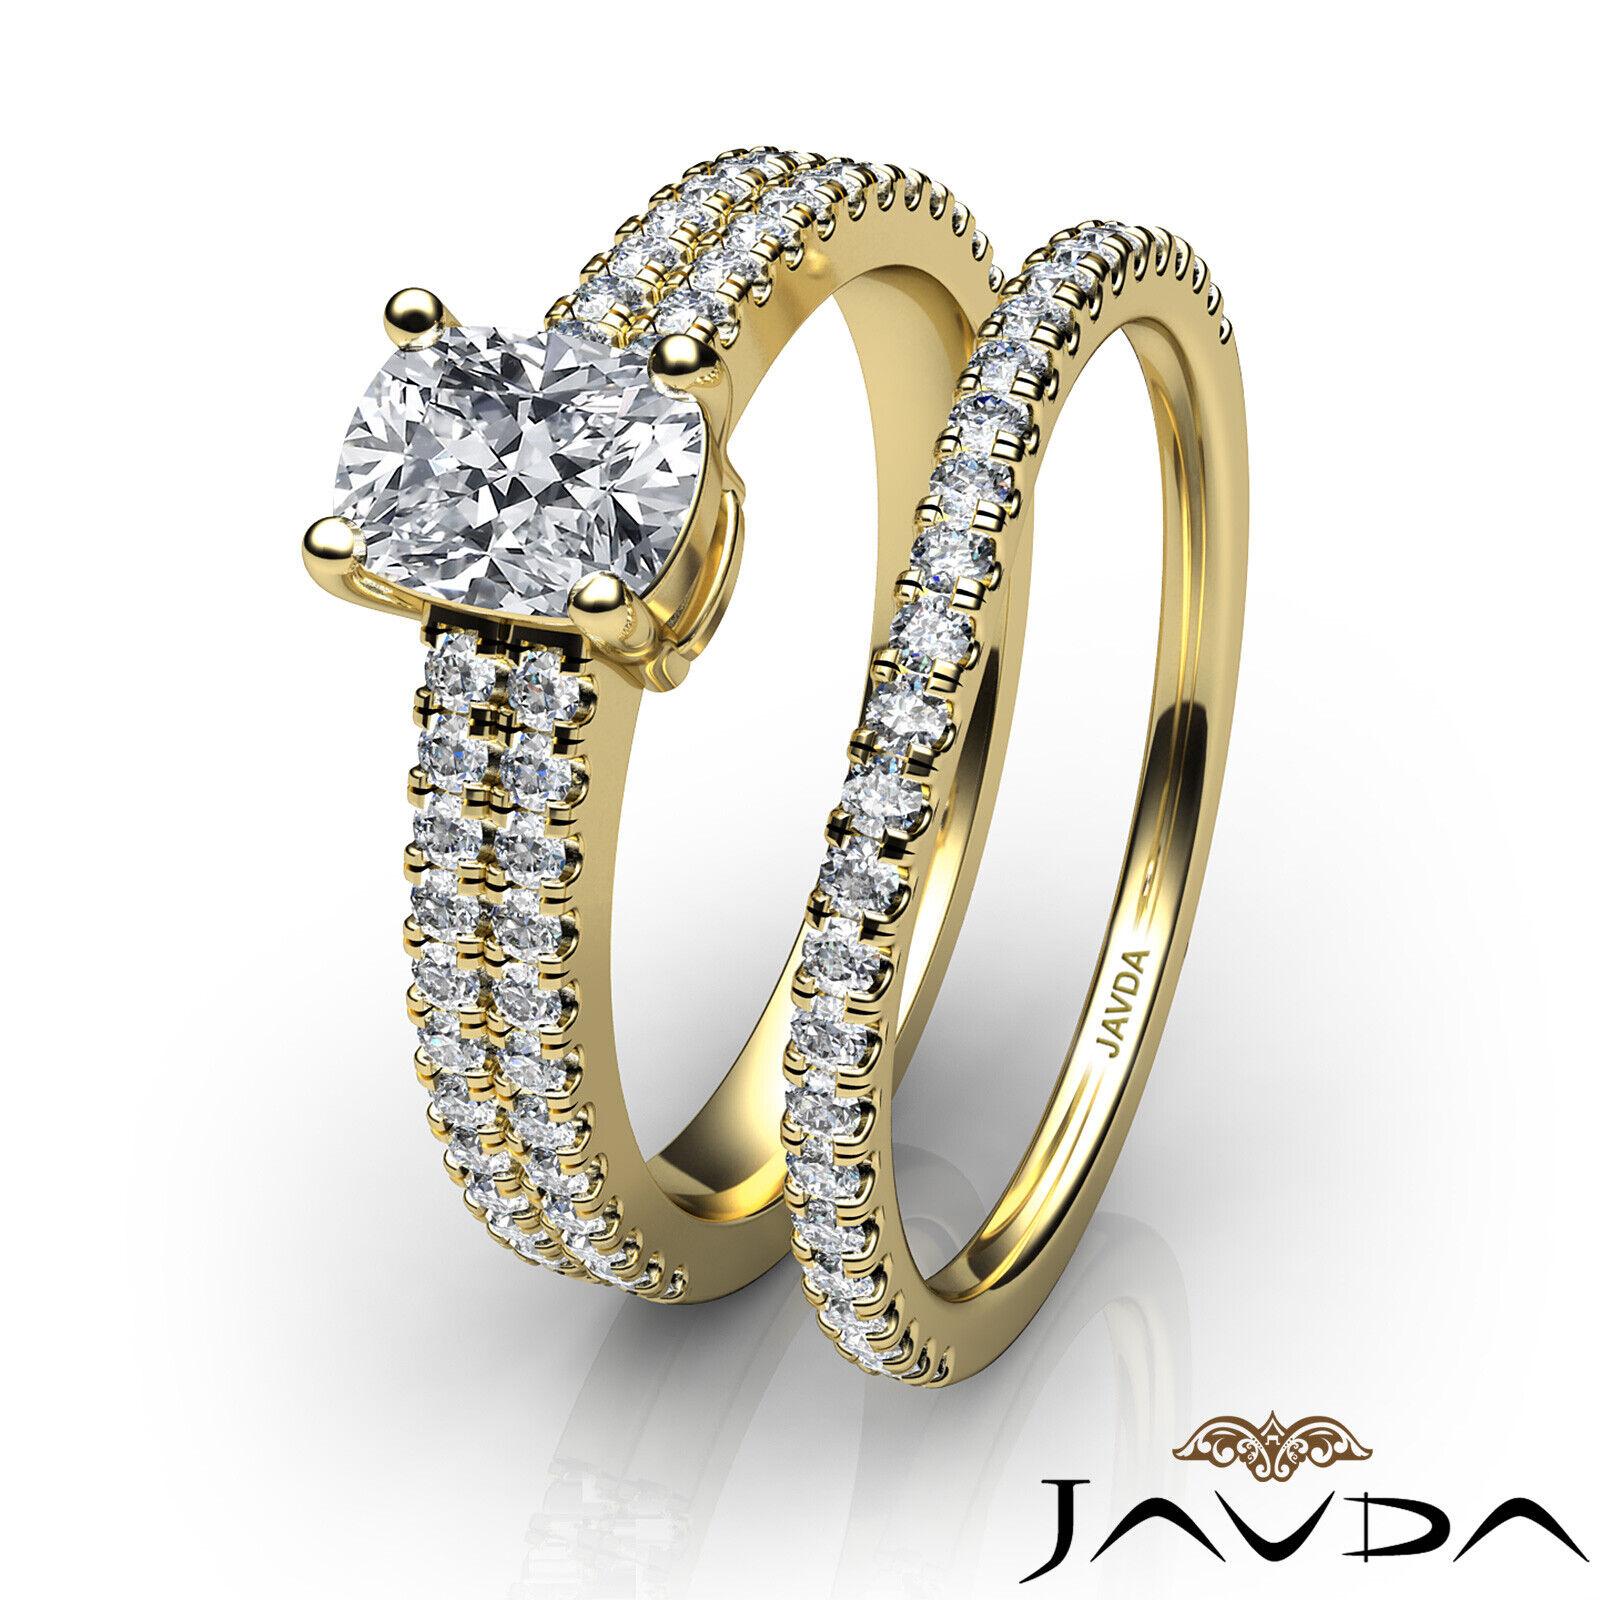 1.8ctw Bridal Scalloped Pave Cushion Diamond Engagement Ring GIA F-VVS2 W Gold 11